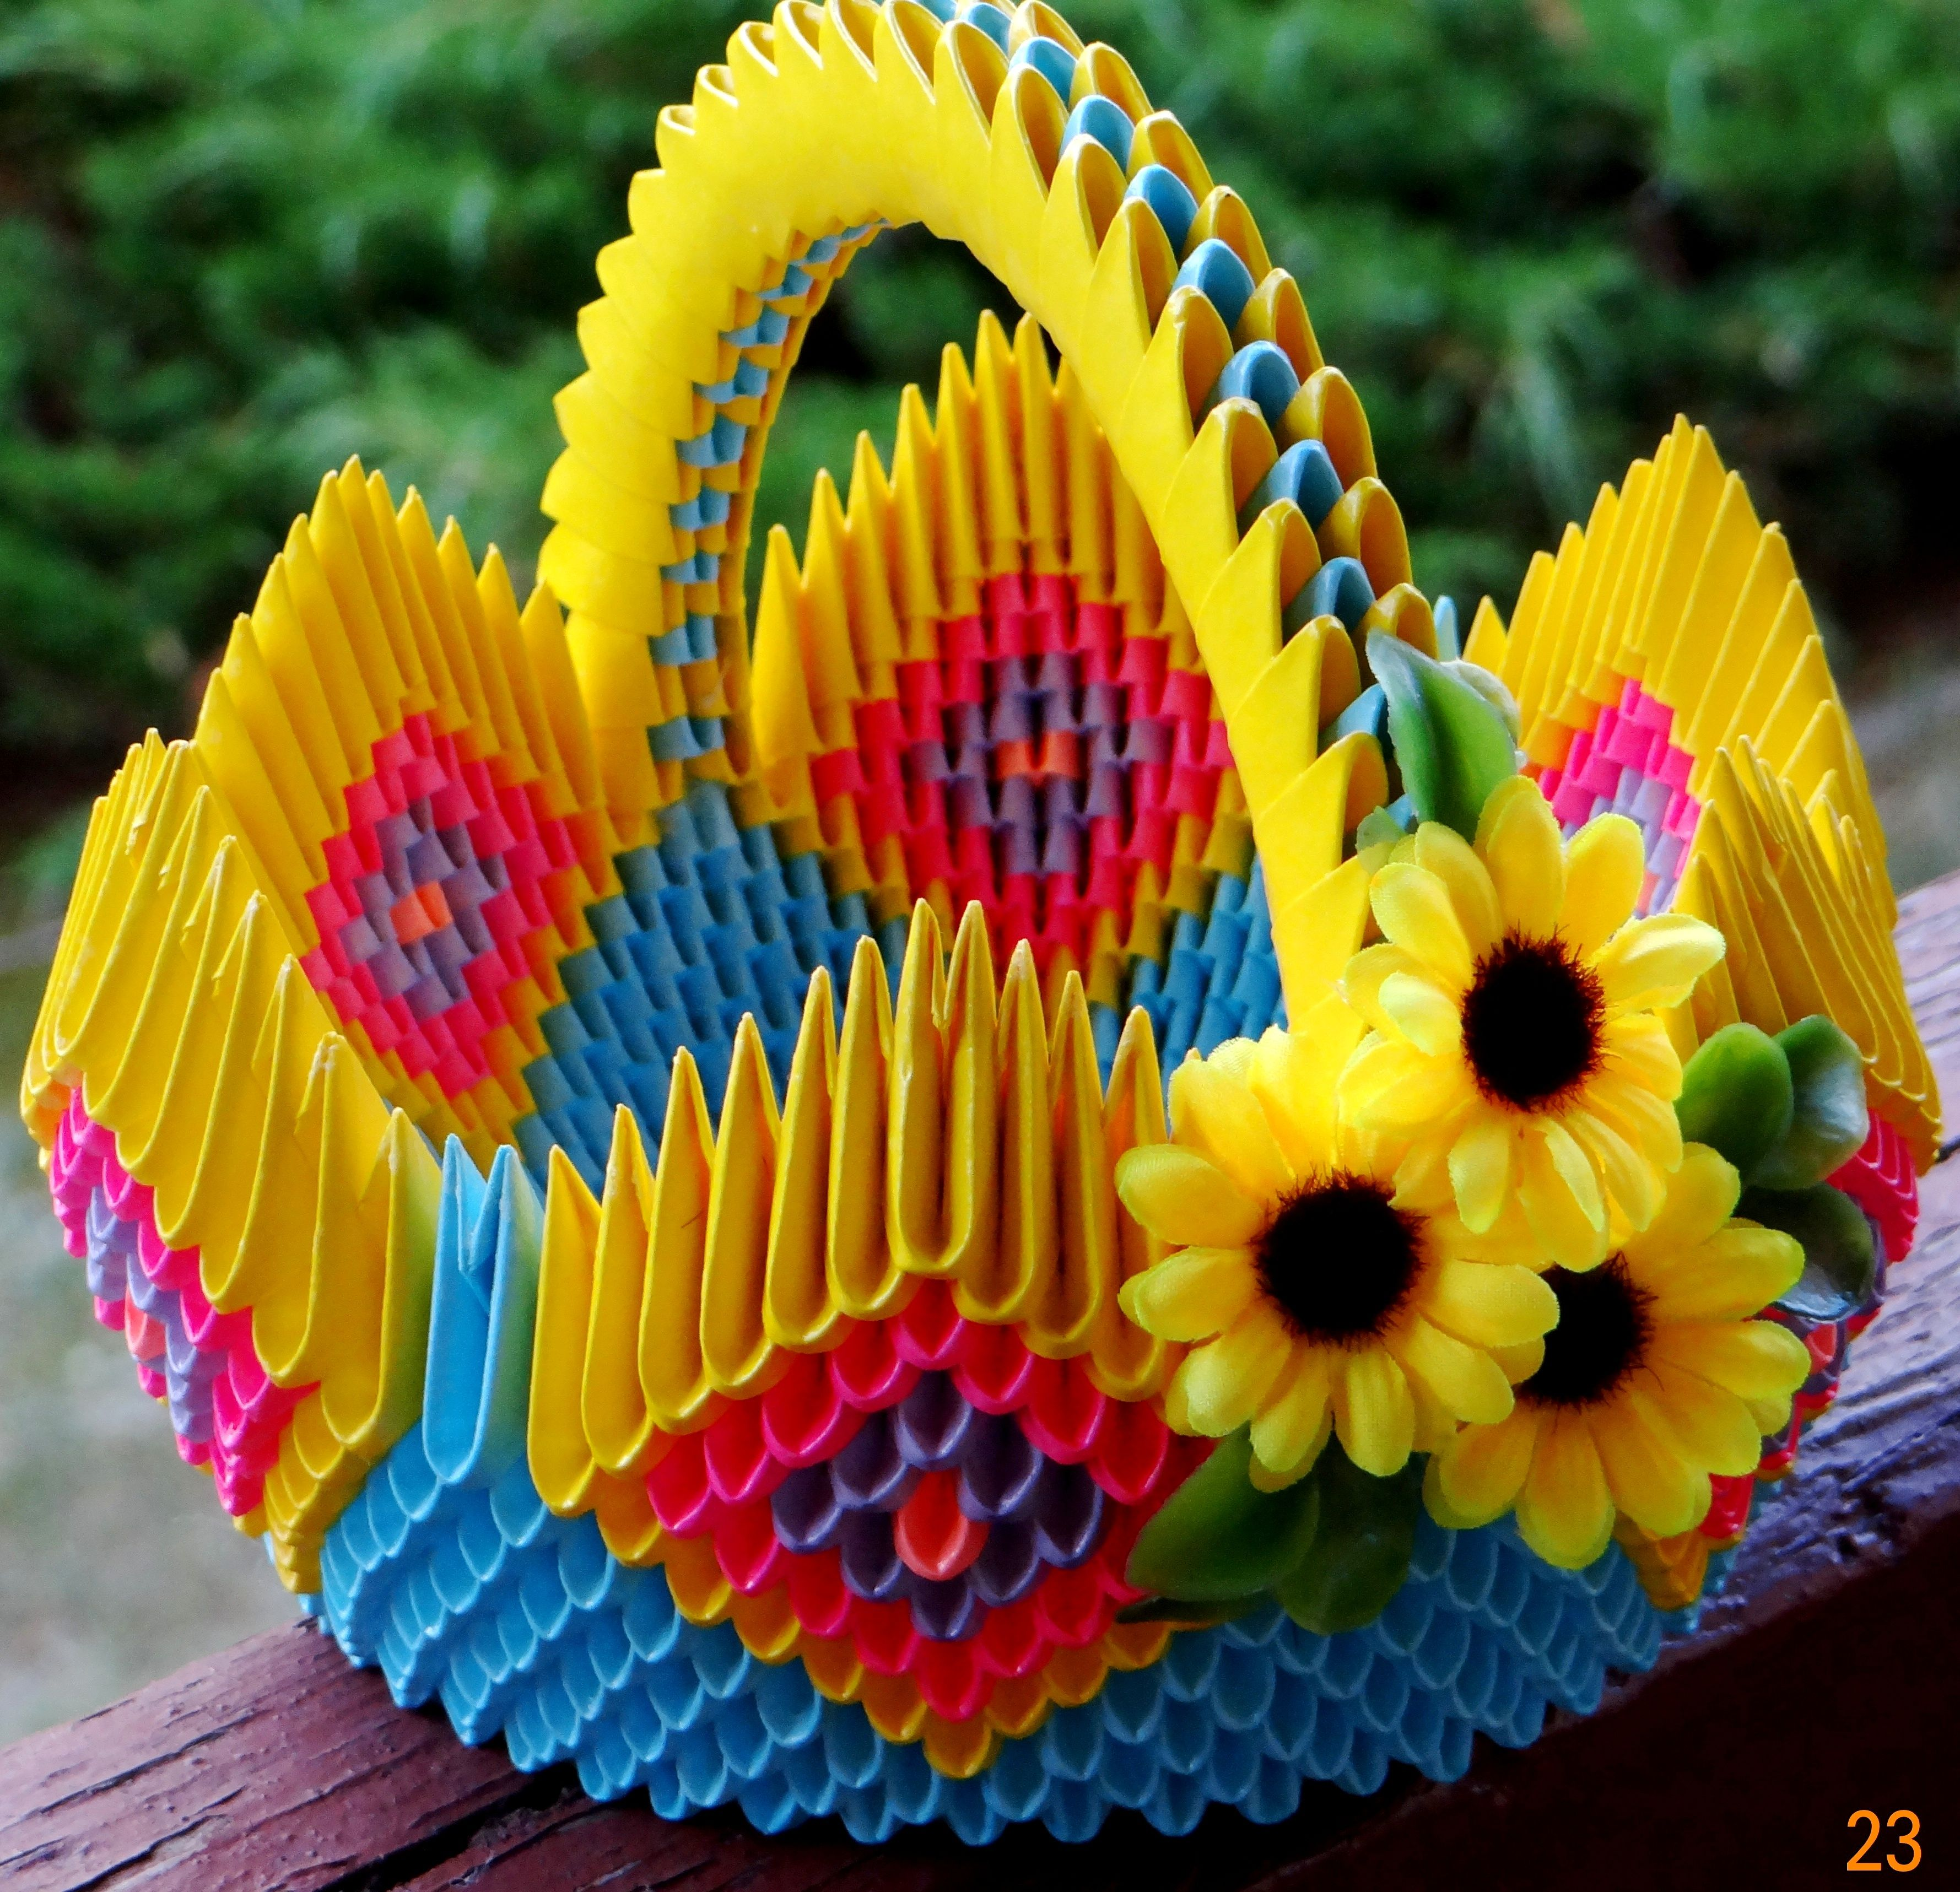 Origami Modulowe 3d Origami Origami Handmade